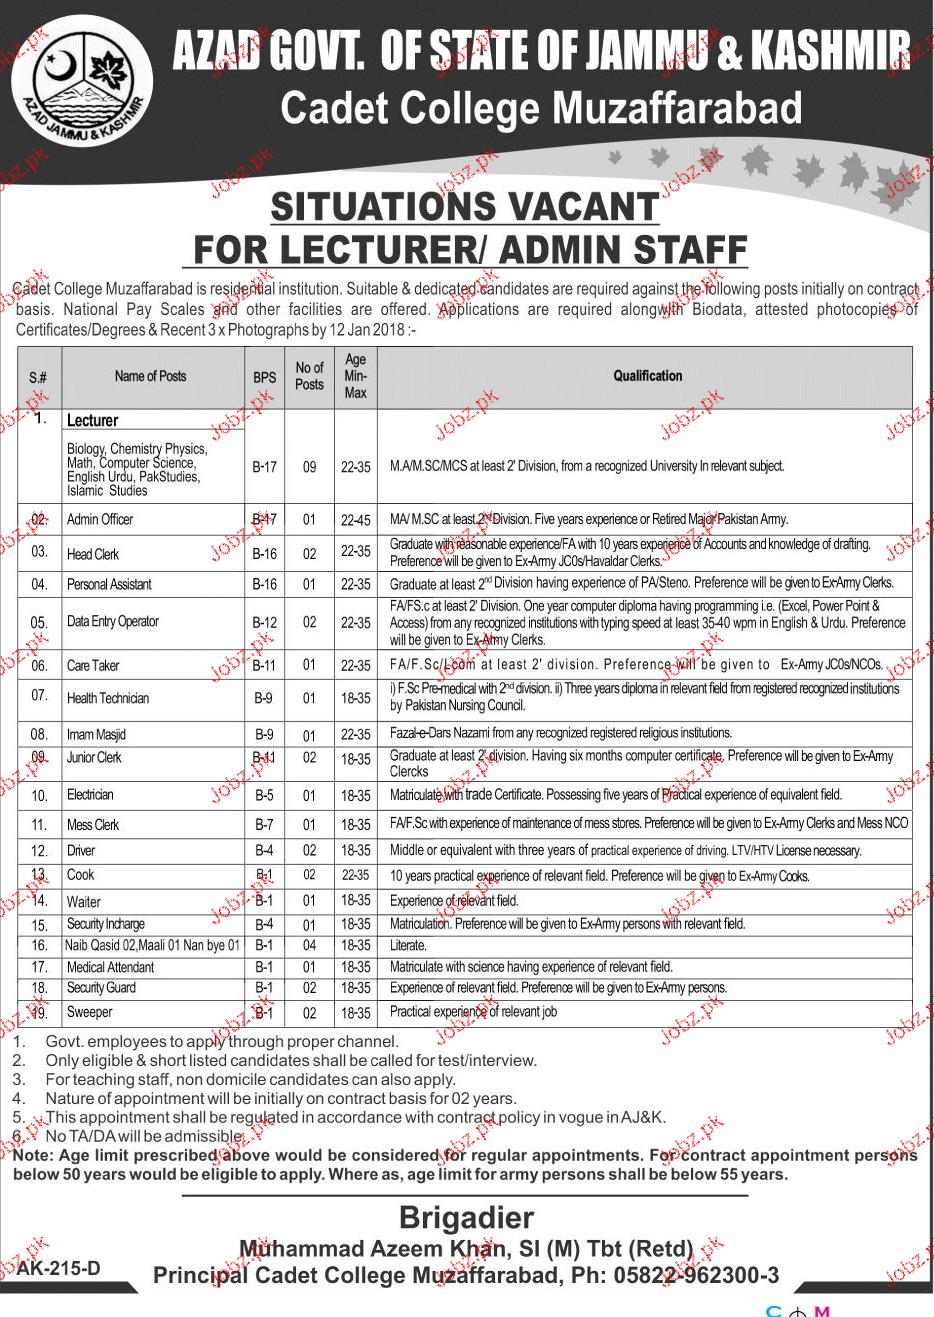 Government of Azad Jammu & Kashmir Cadet College Jobs